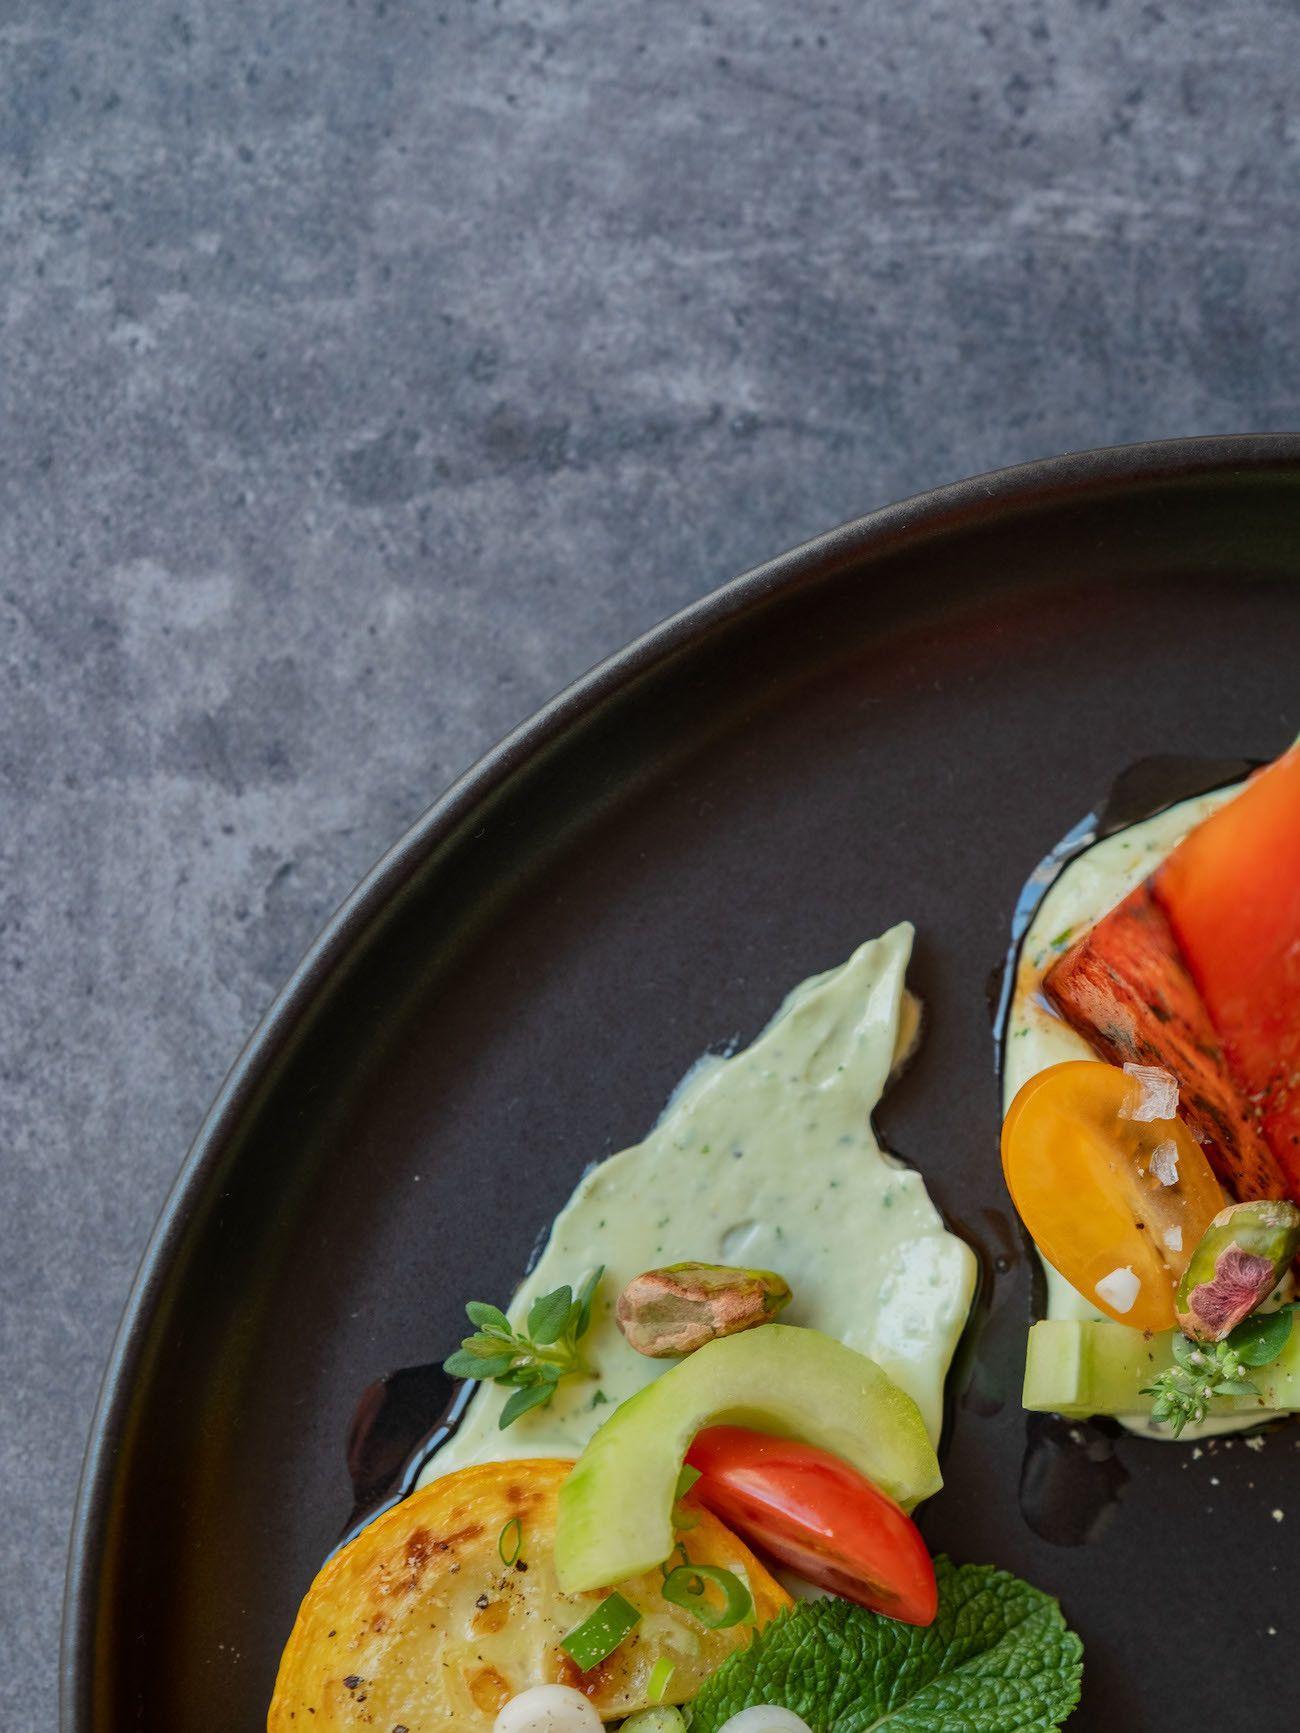 Foodblog, About Fuel, Rezept, Wassermelonensalat auf Basilikum-Feta-Creme, Olivenöl, Gurke, Tomaten, Zucchini, Pistazien